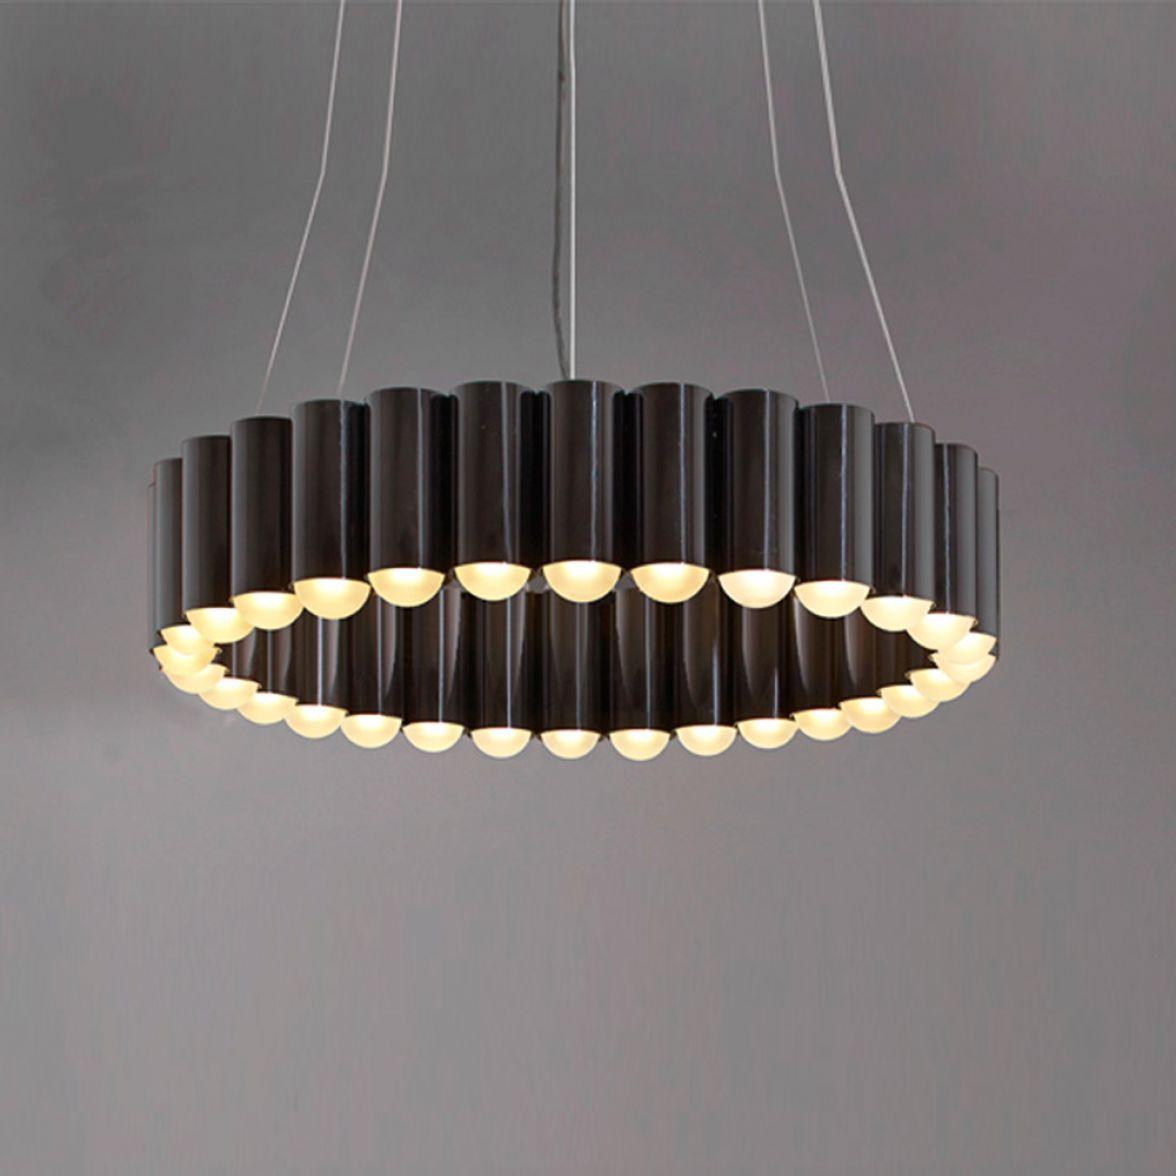 Carousel Light pendant фото цена